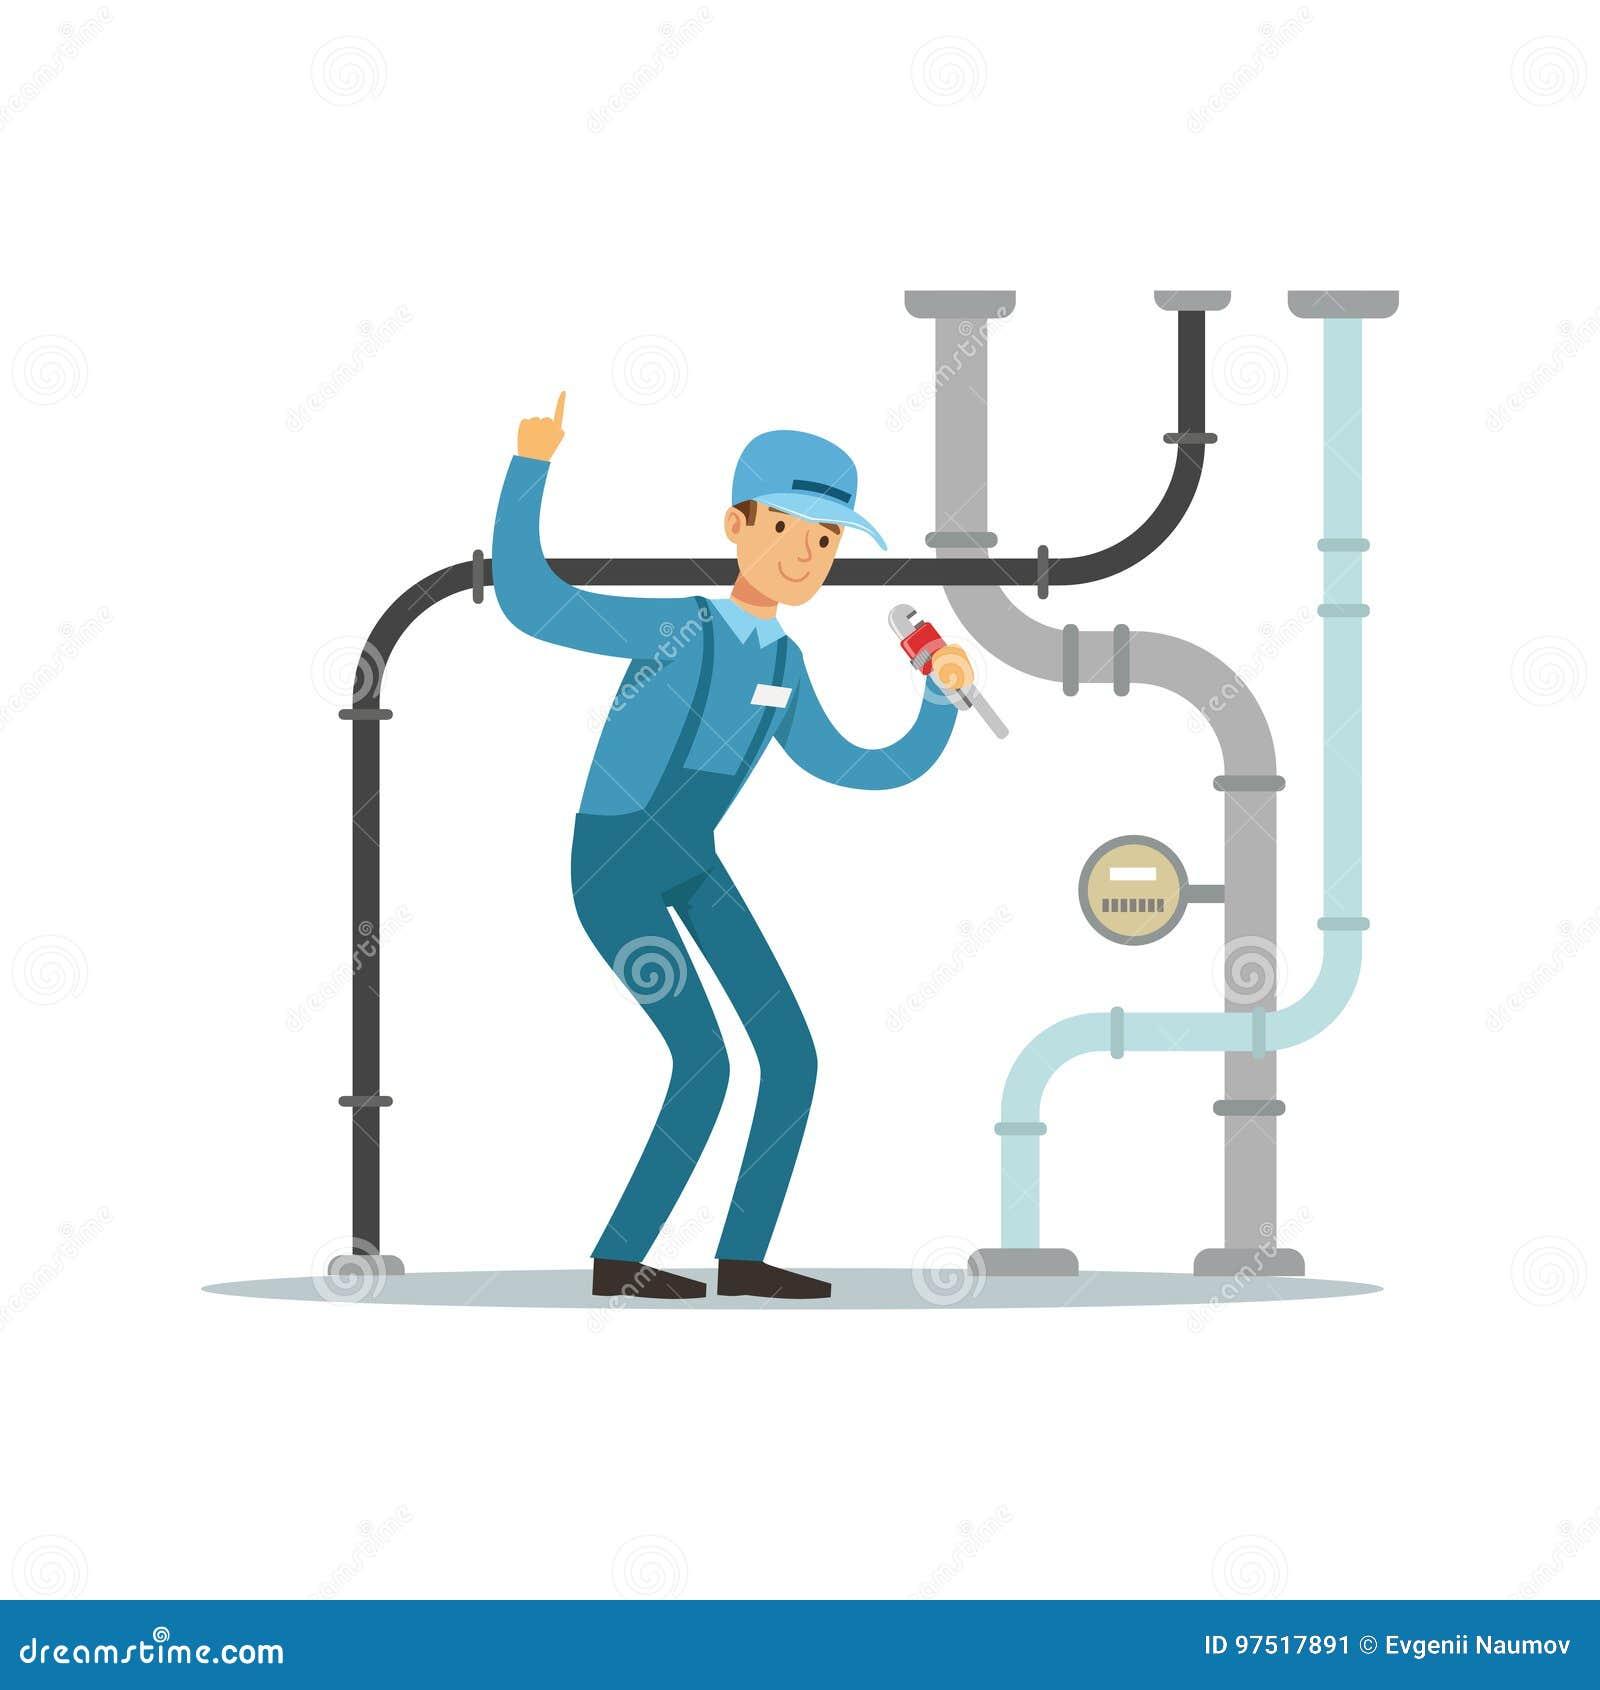 Proffesional水管工人字符修理和固定的水管,测量深度工作传染媒介例证